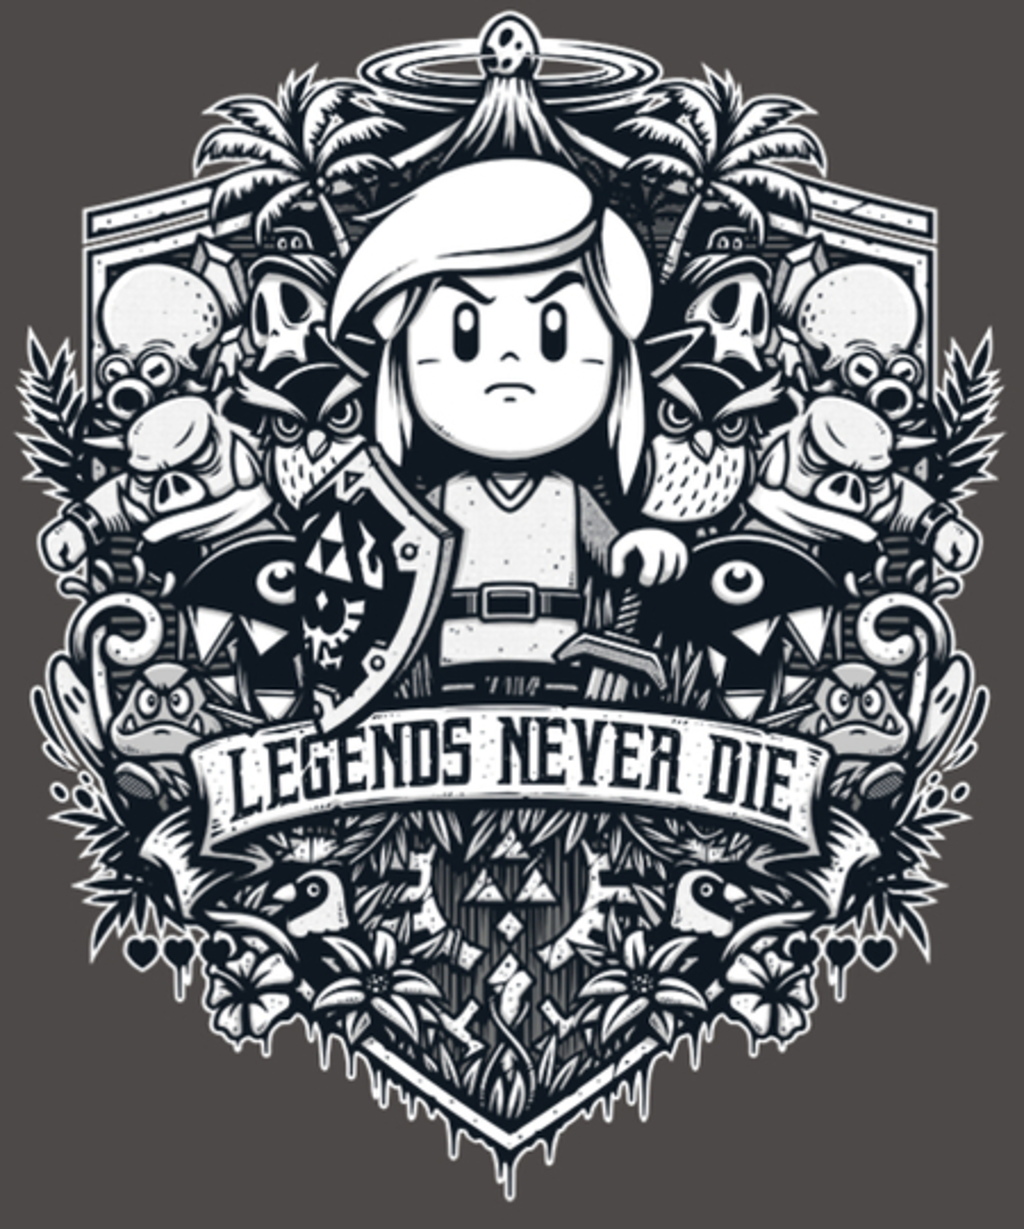 Qwertee: Legends never die